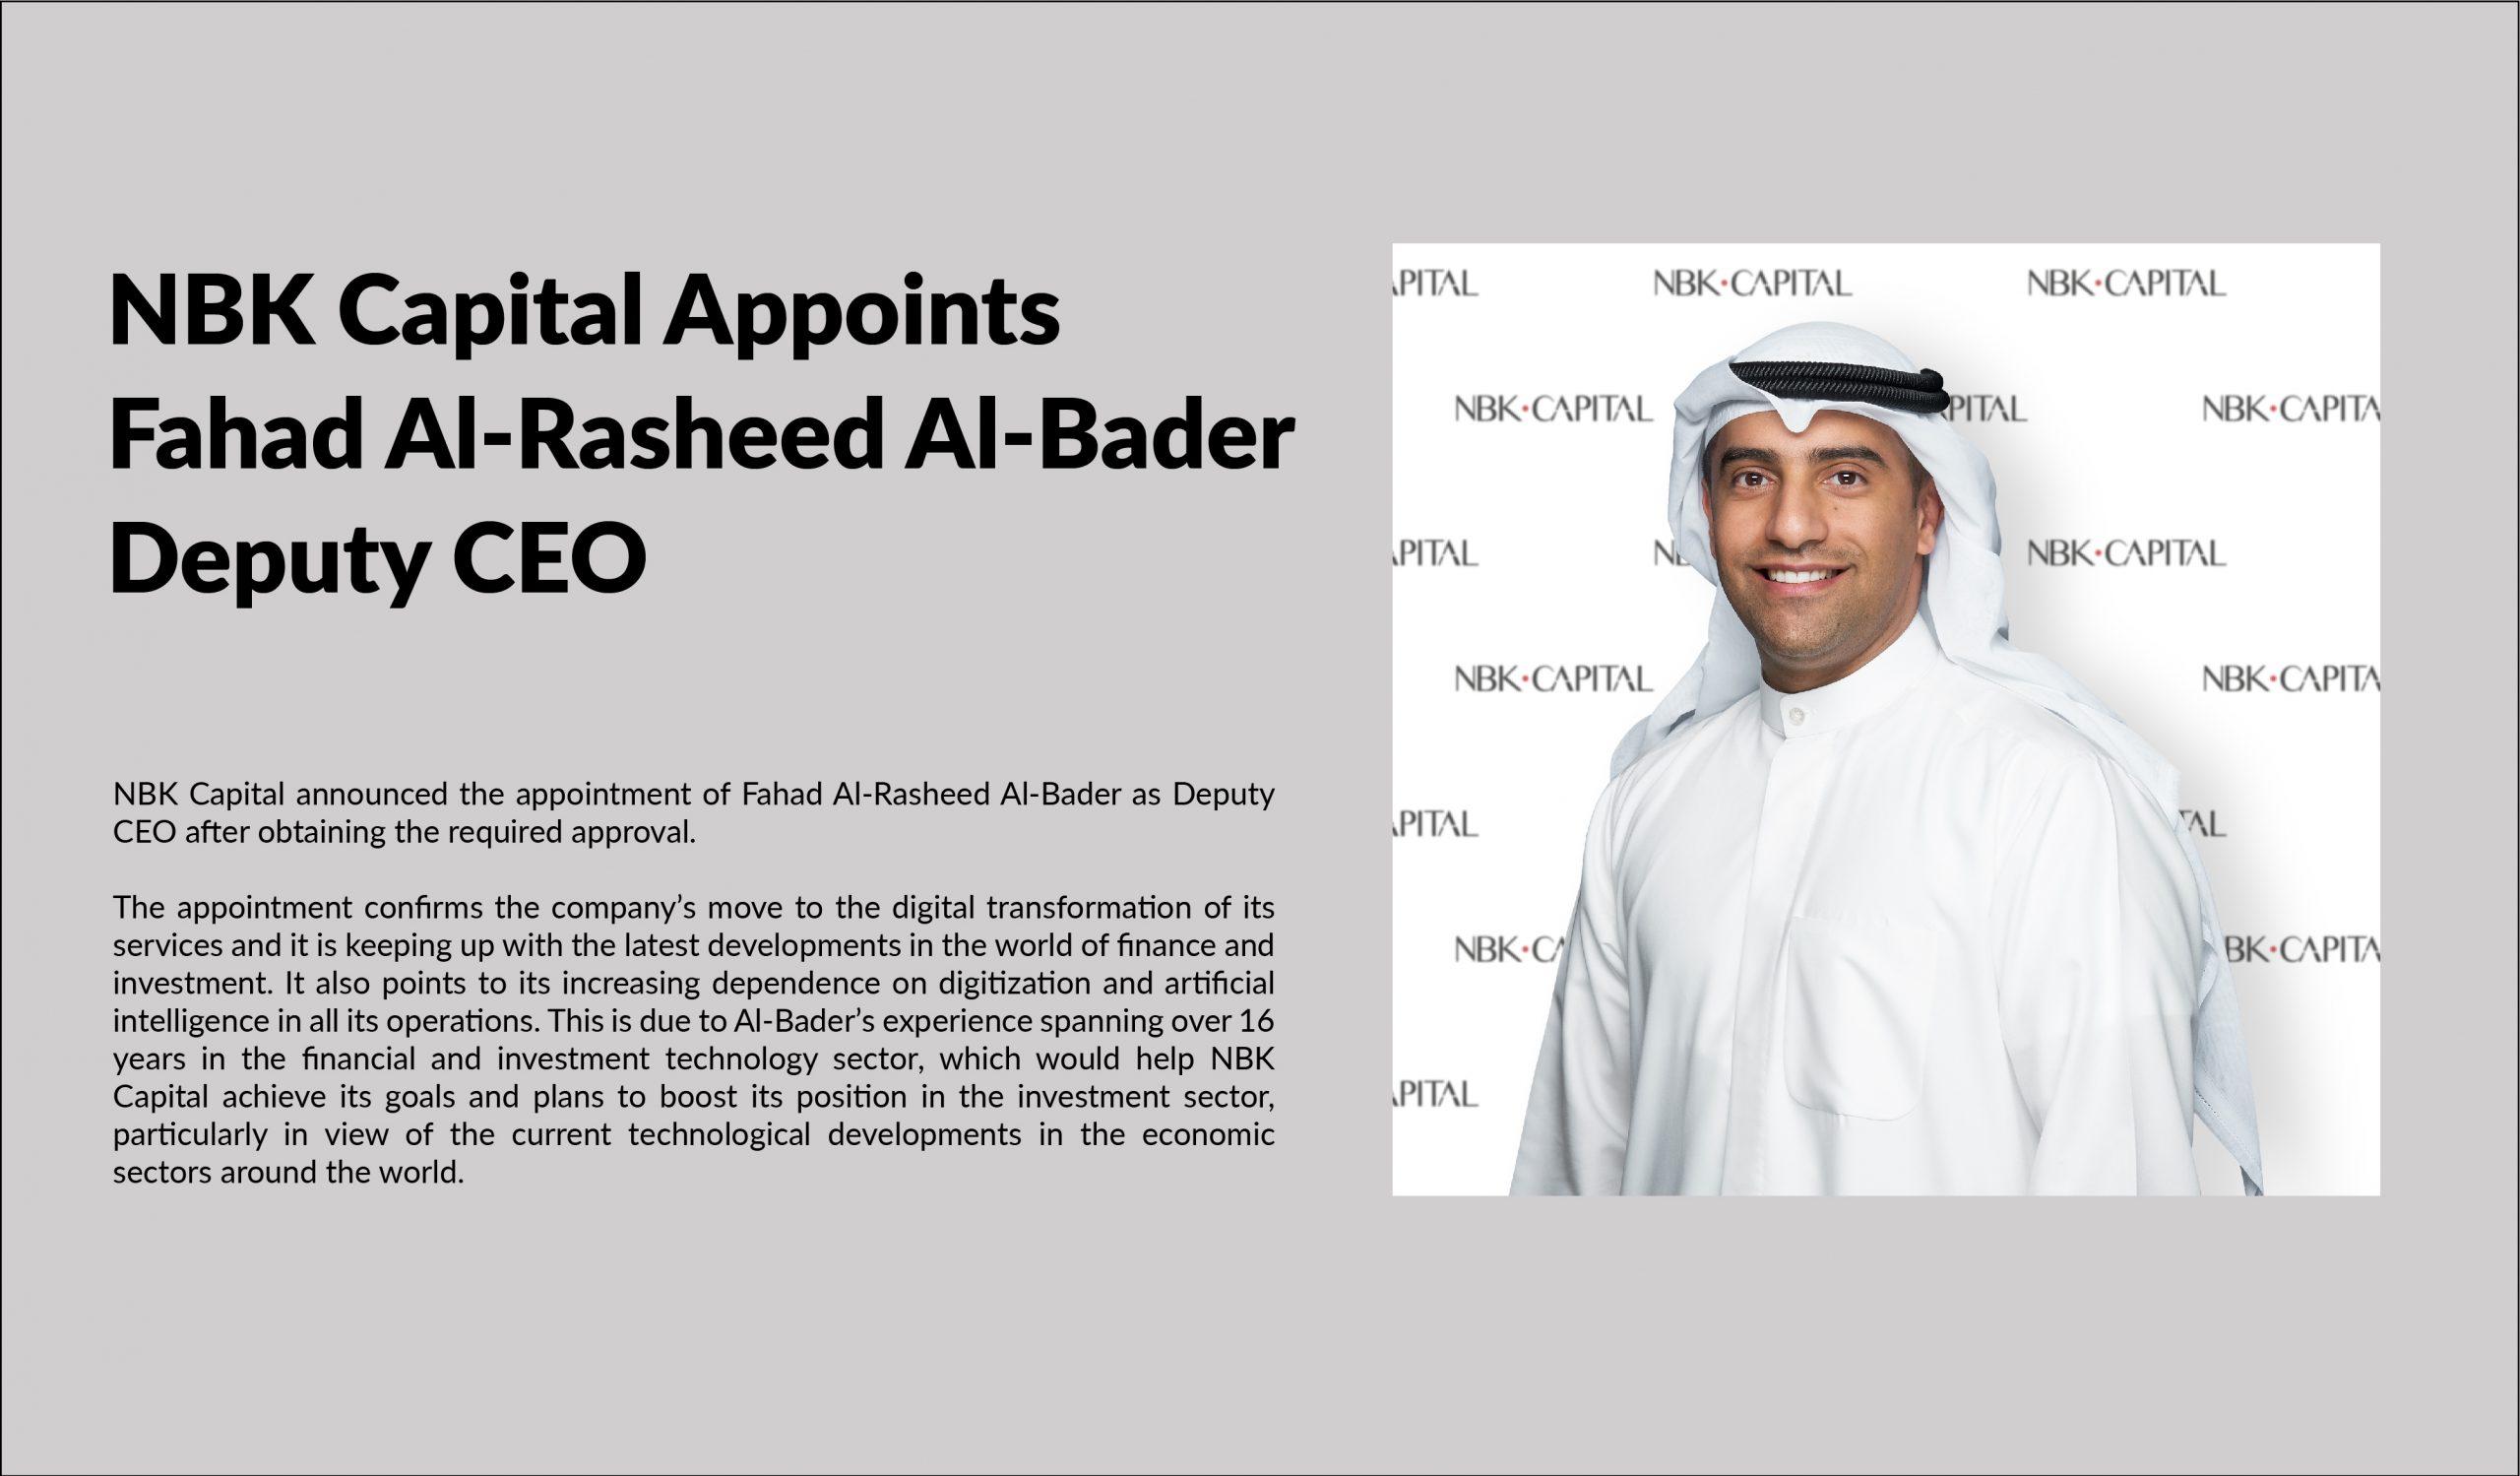 NBK Capital Appoints Fahad Al-Rasheed Al-Bader Deputy CEO